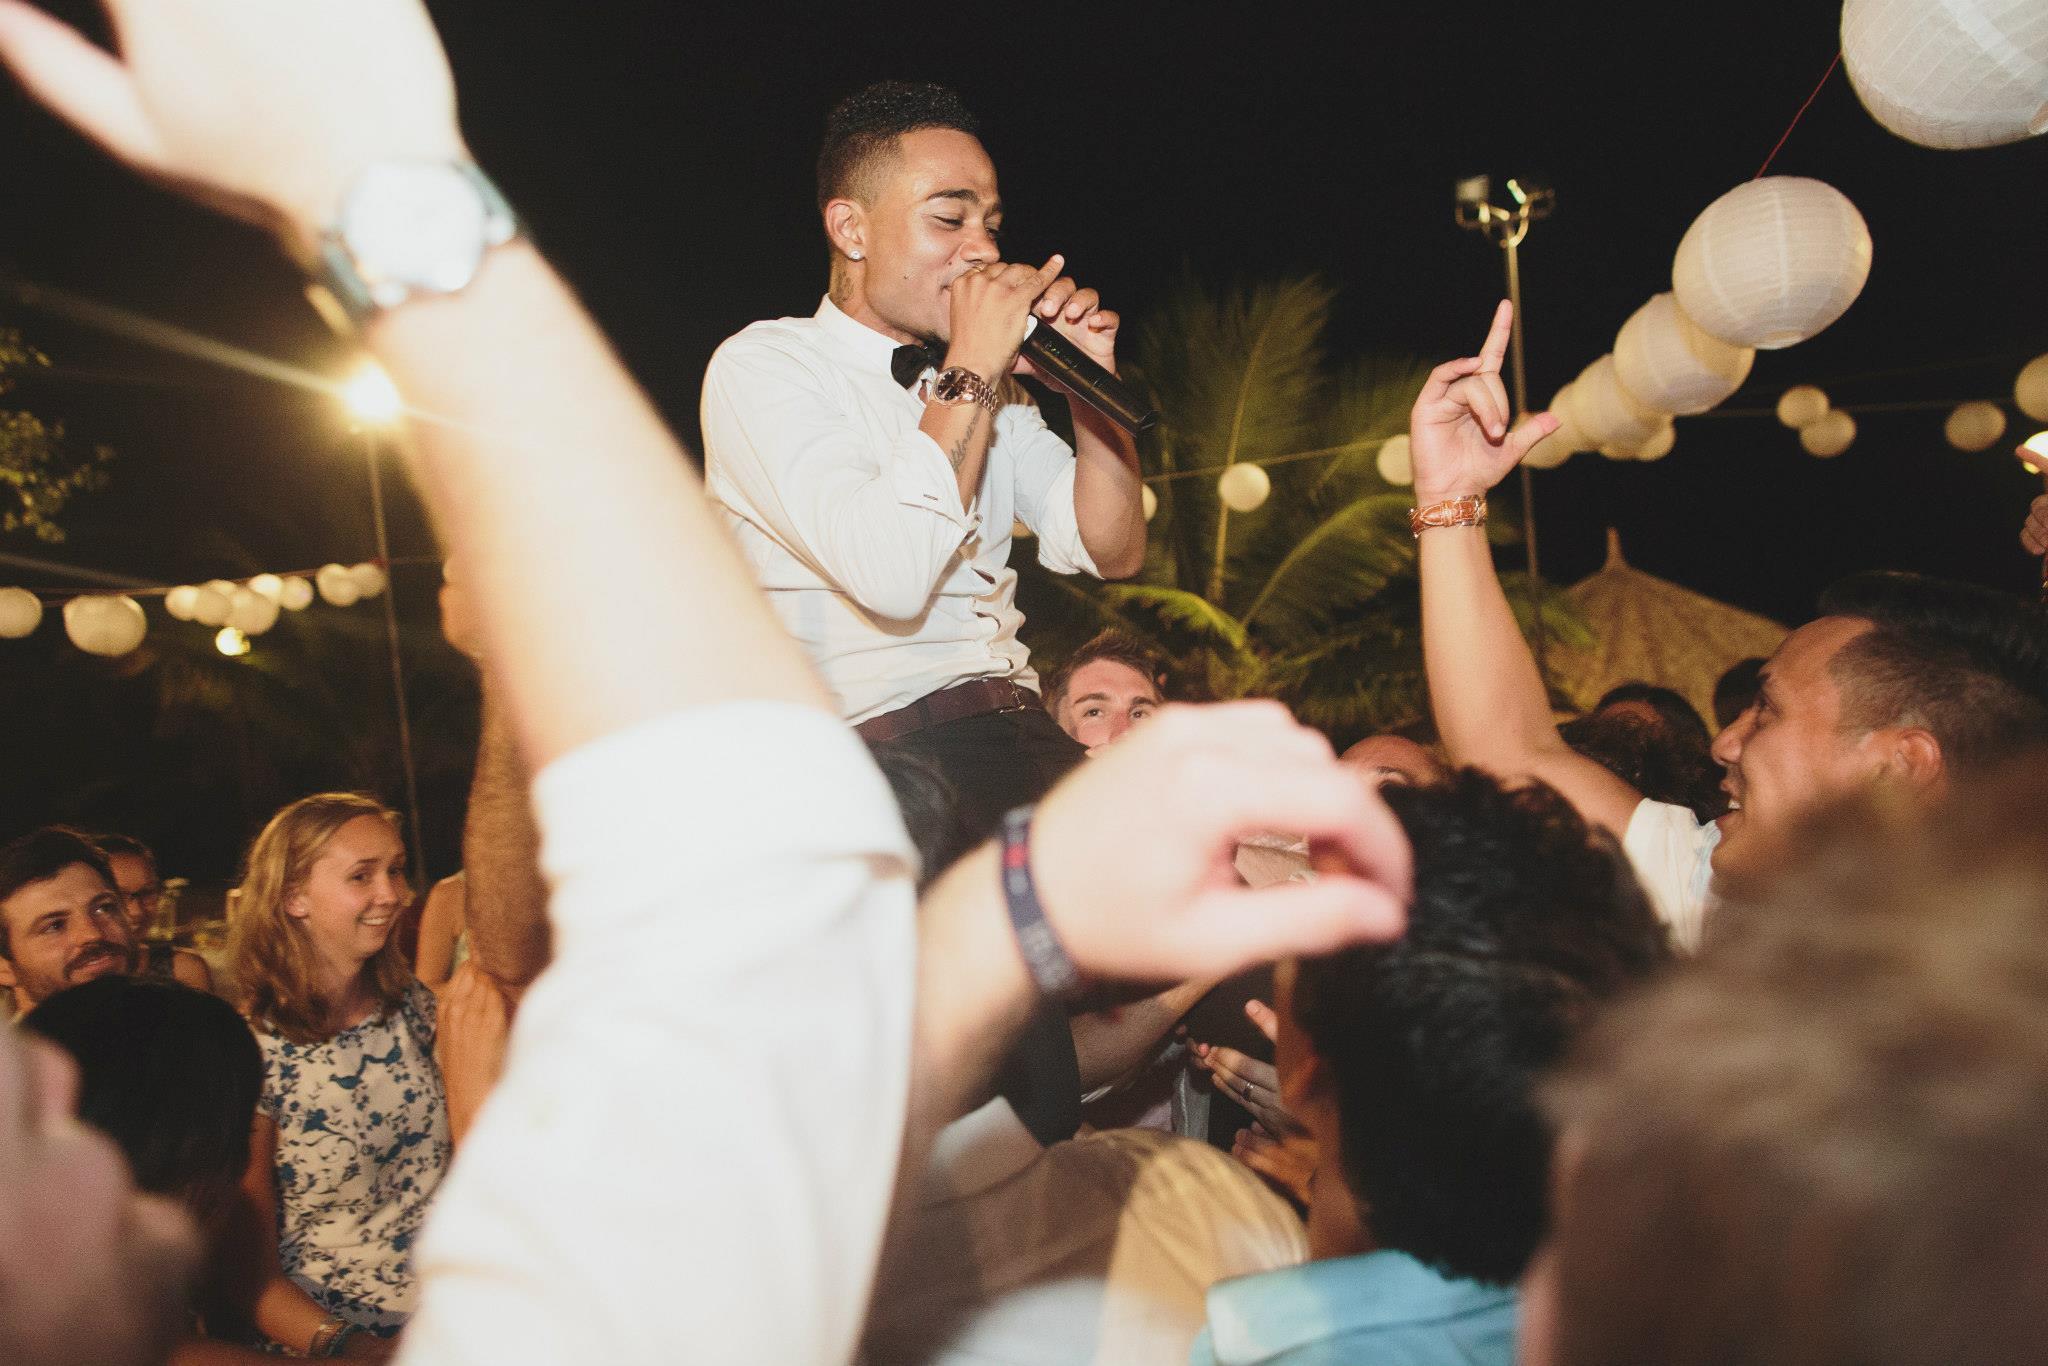 Mike Champion Weddings